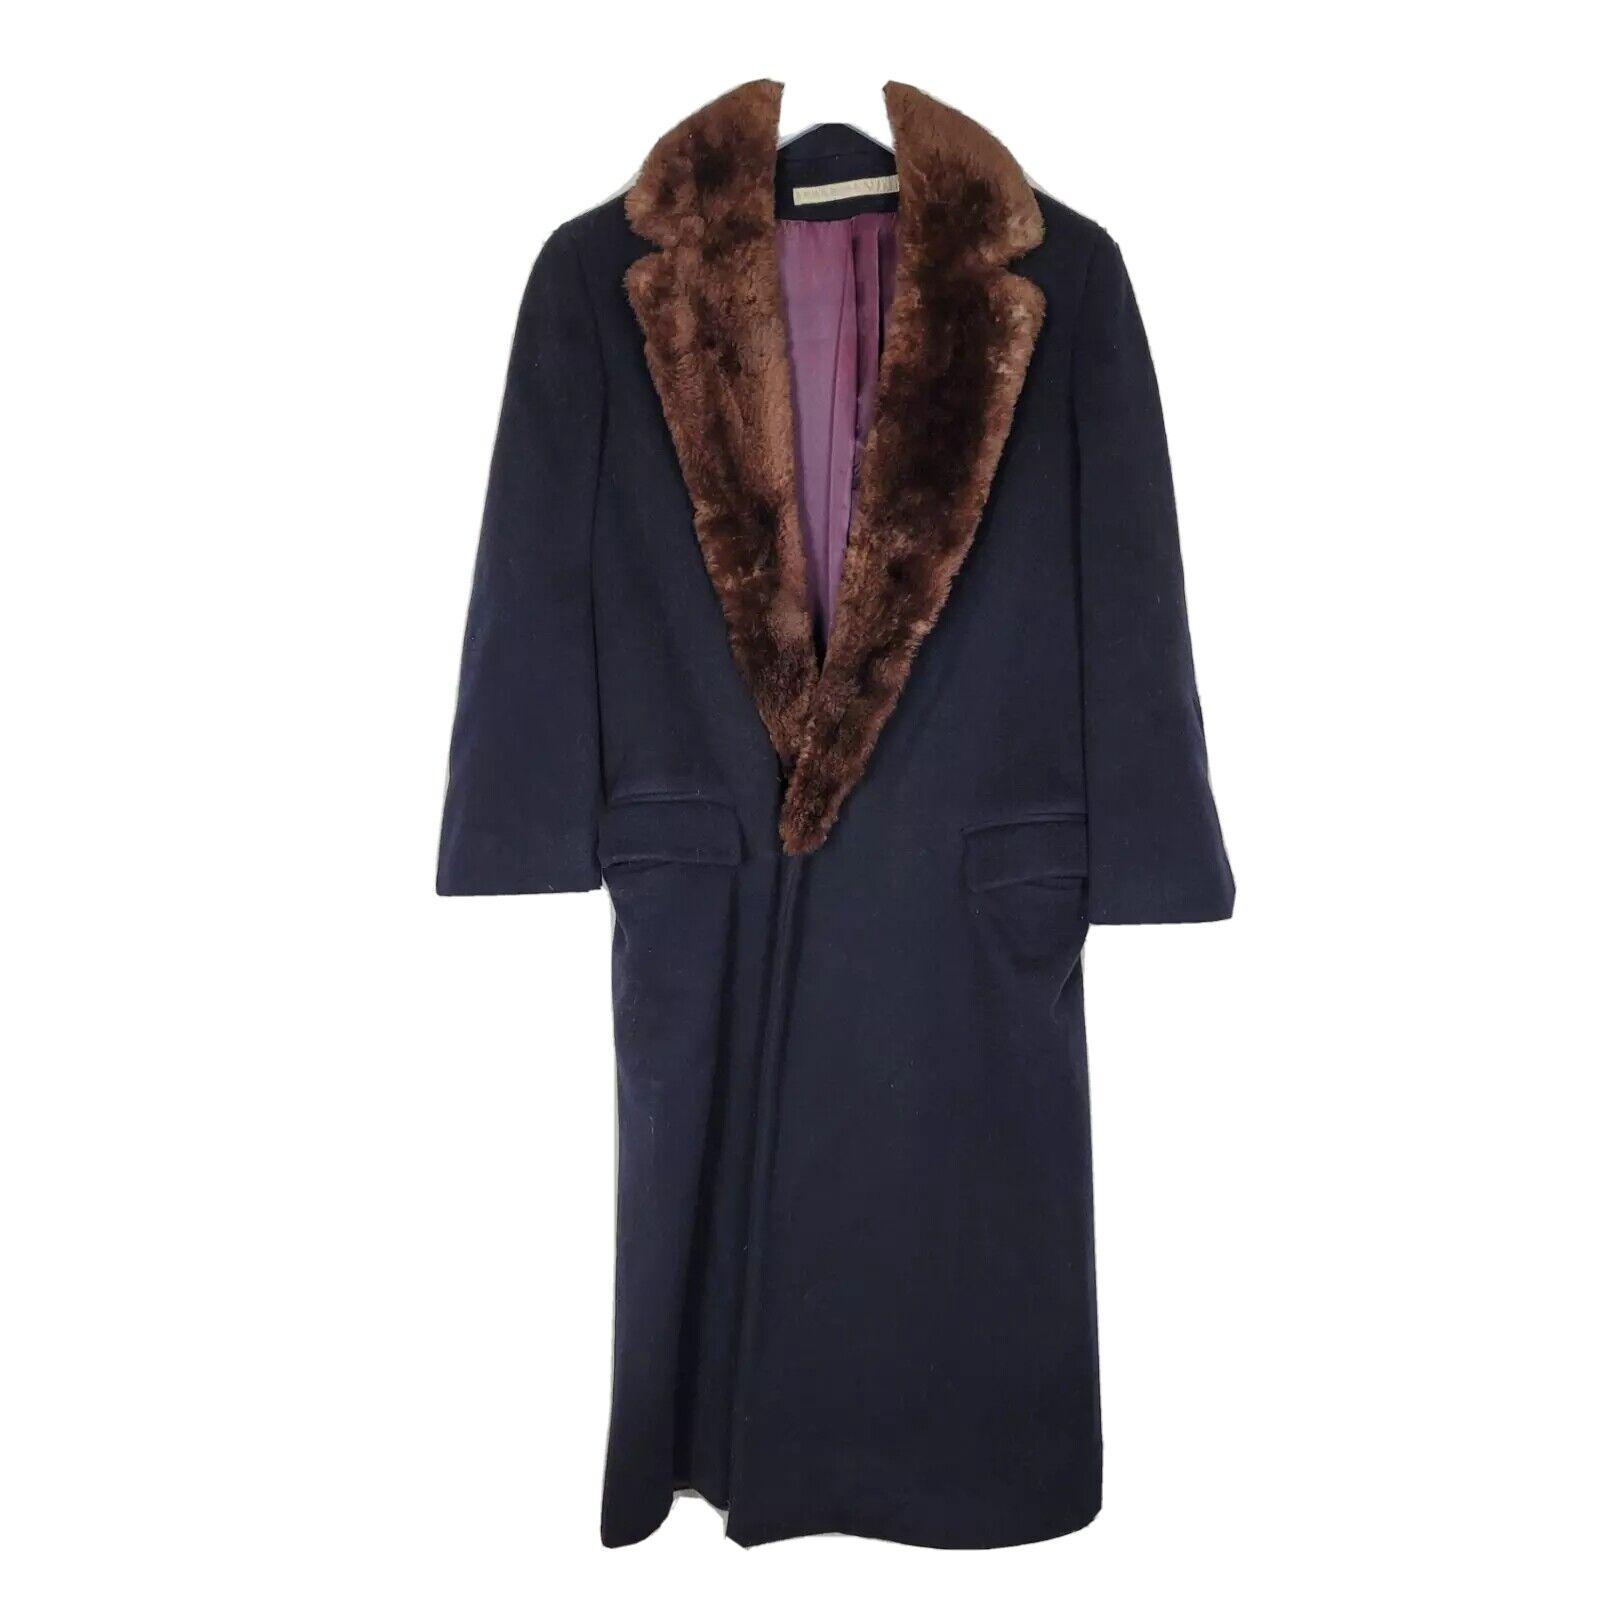 Vintage Perry Ellis Unisex Blue Long Sleeve Faux Fur Collared Wool Coat Size 4